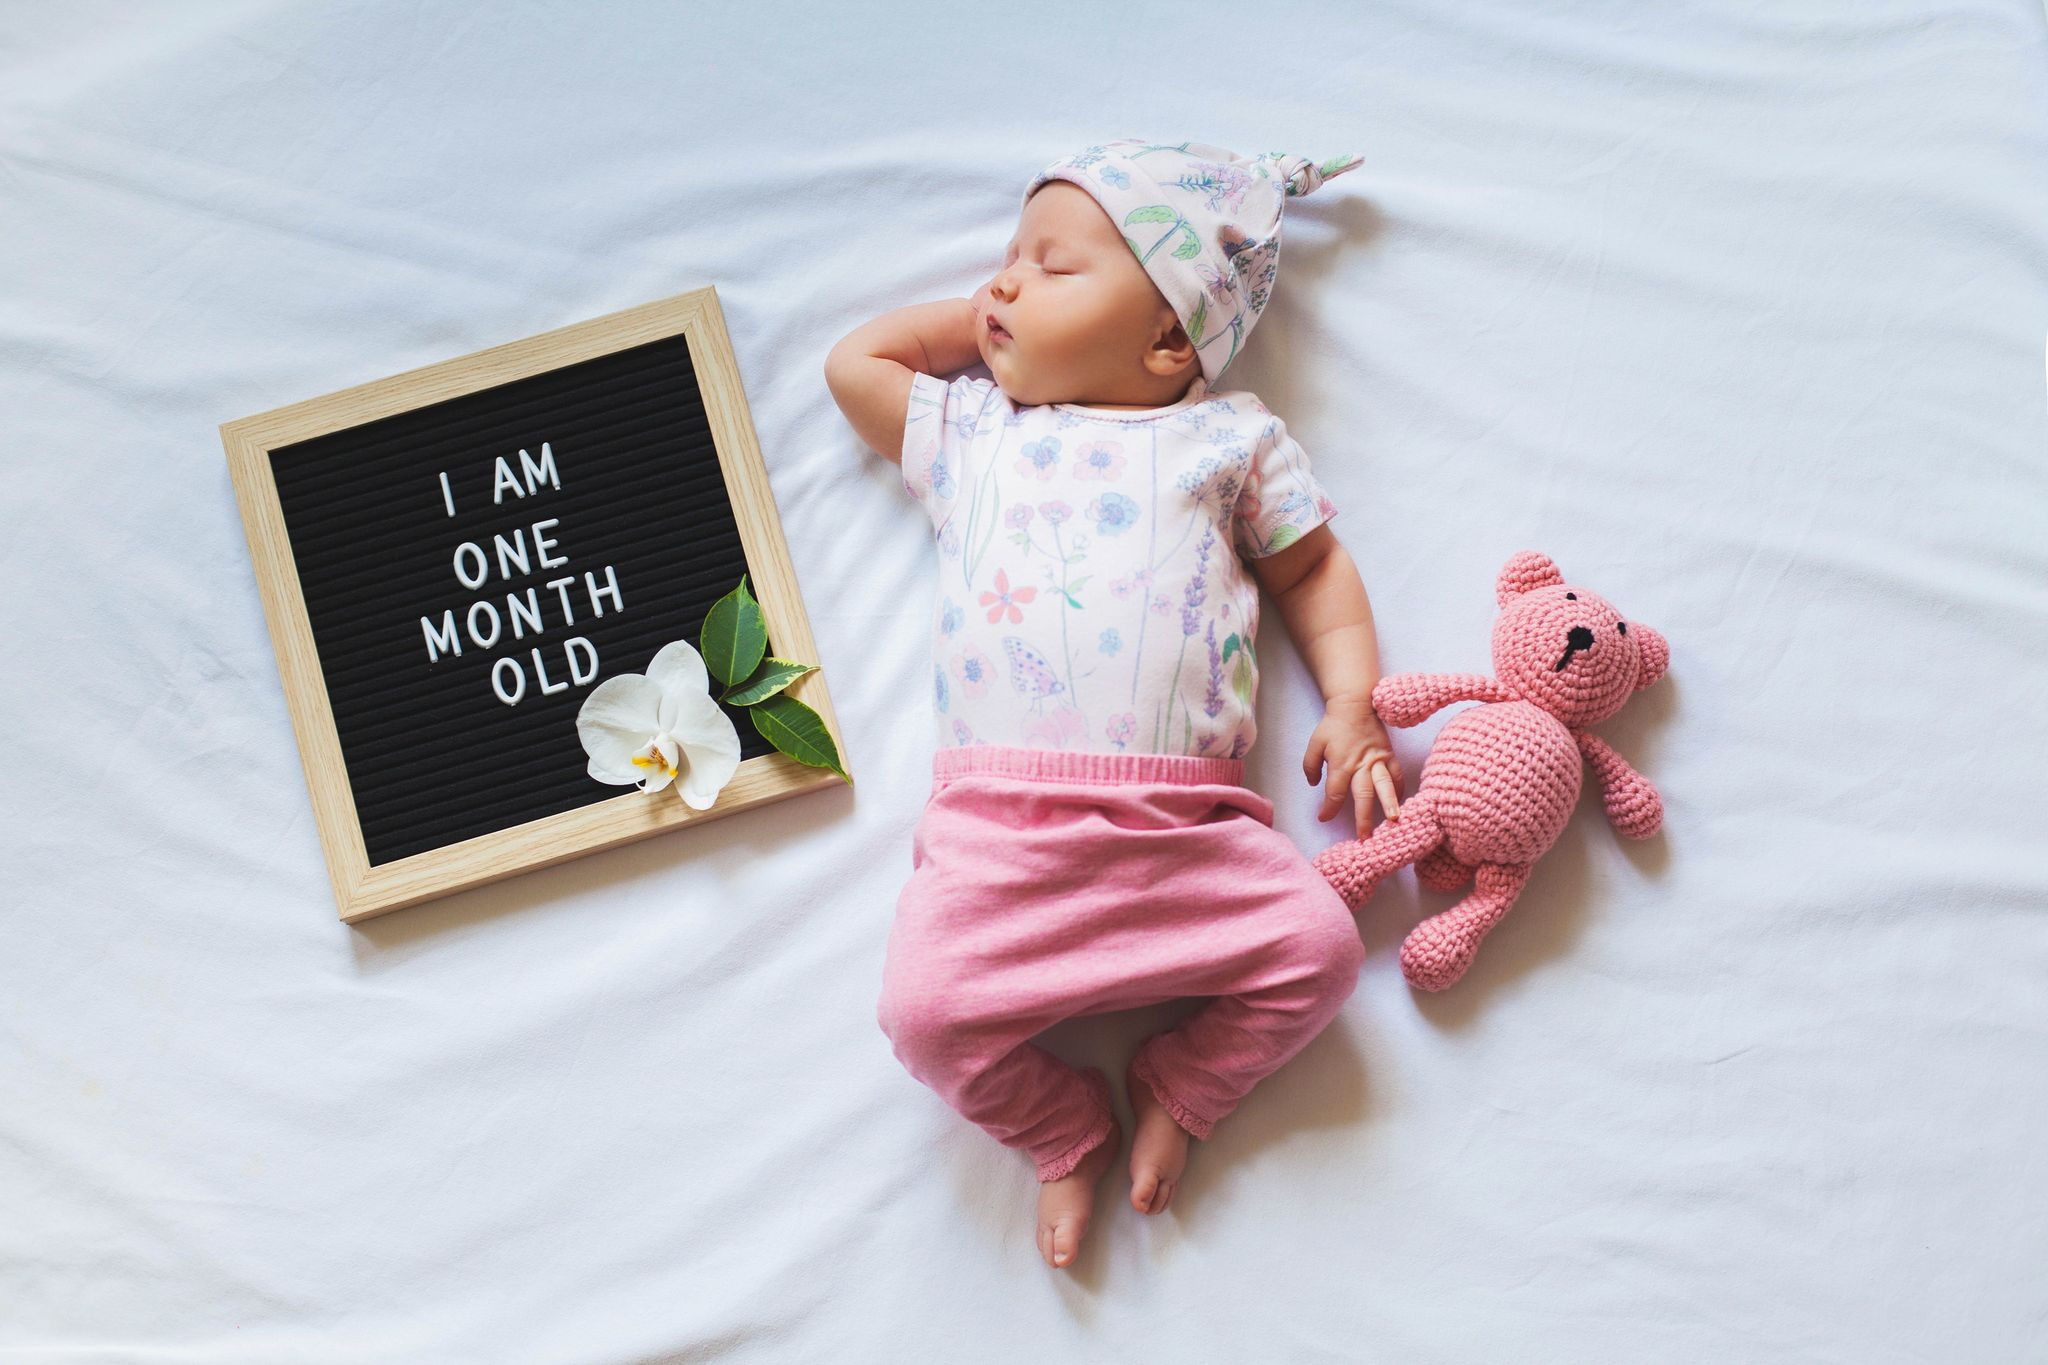 S'occuper d'un bébé 1 mois